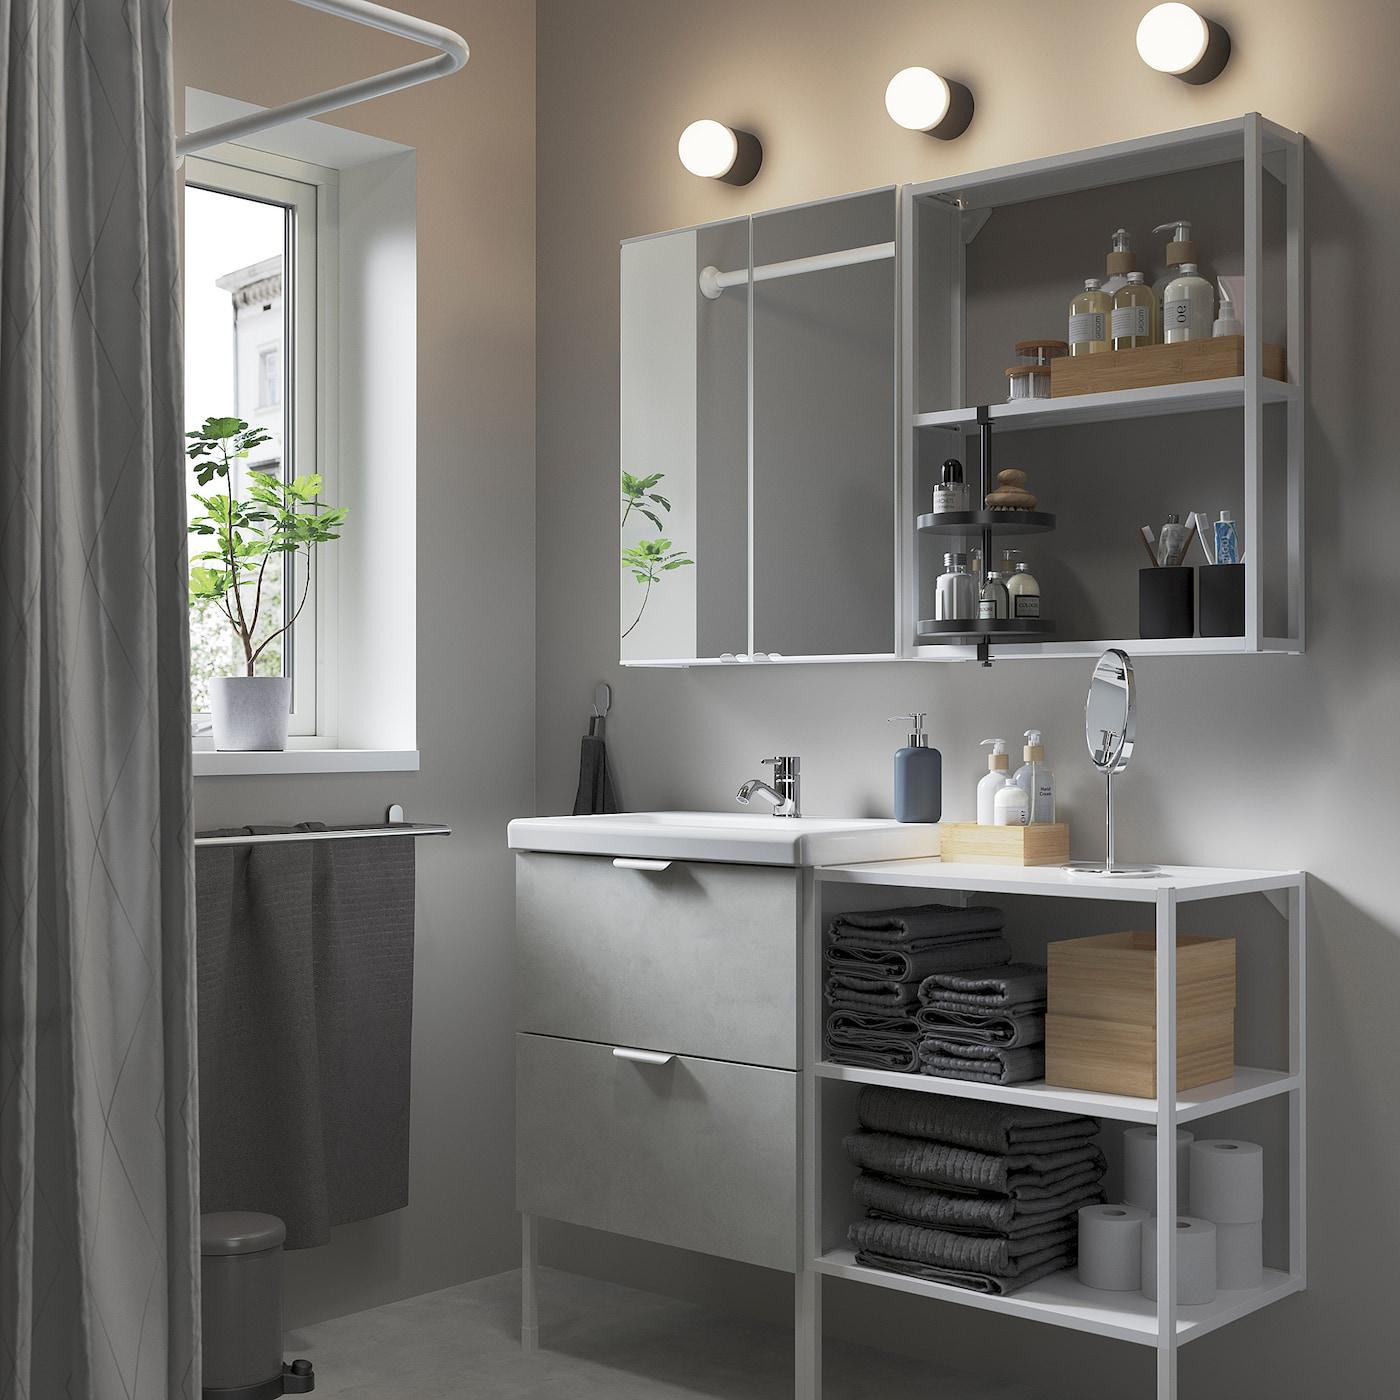 ENHET / TVÄLLEN Bathroom furniture, set of 15, concrete effect/white Pilkån tap, 122x43x87 cm